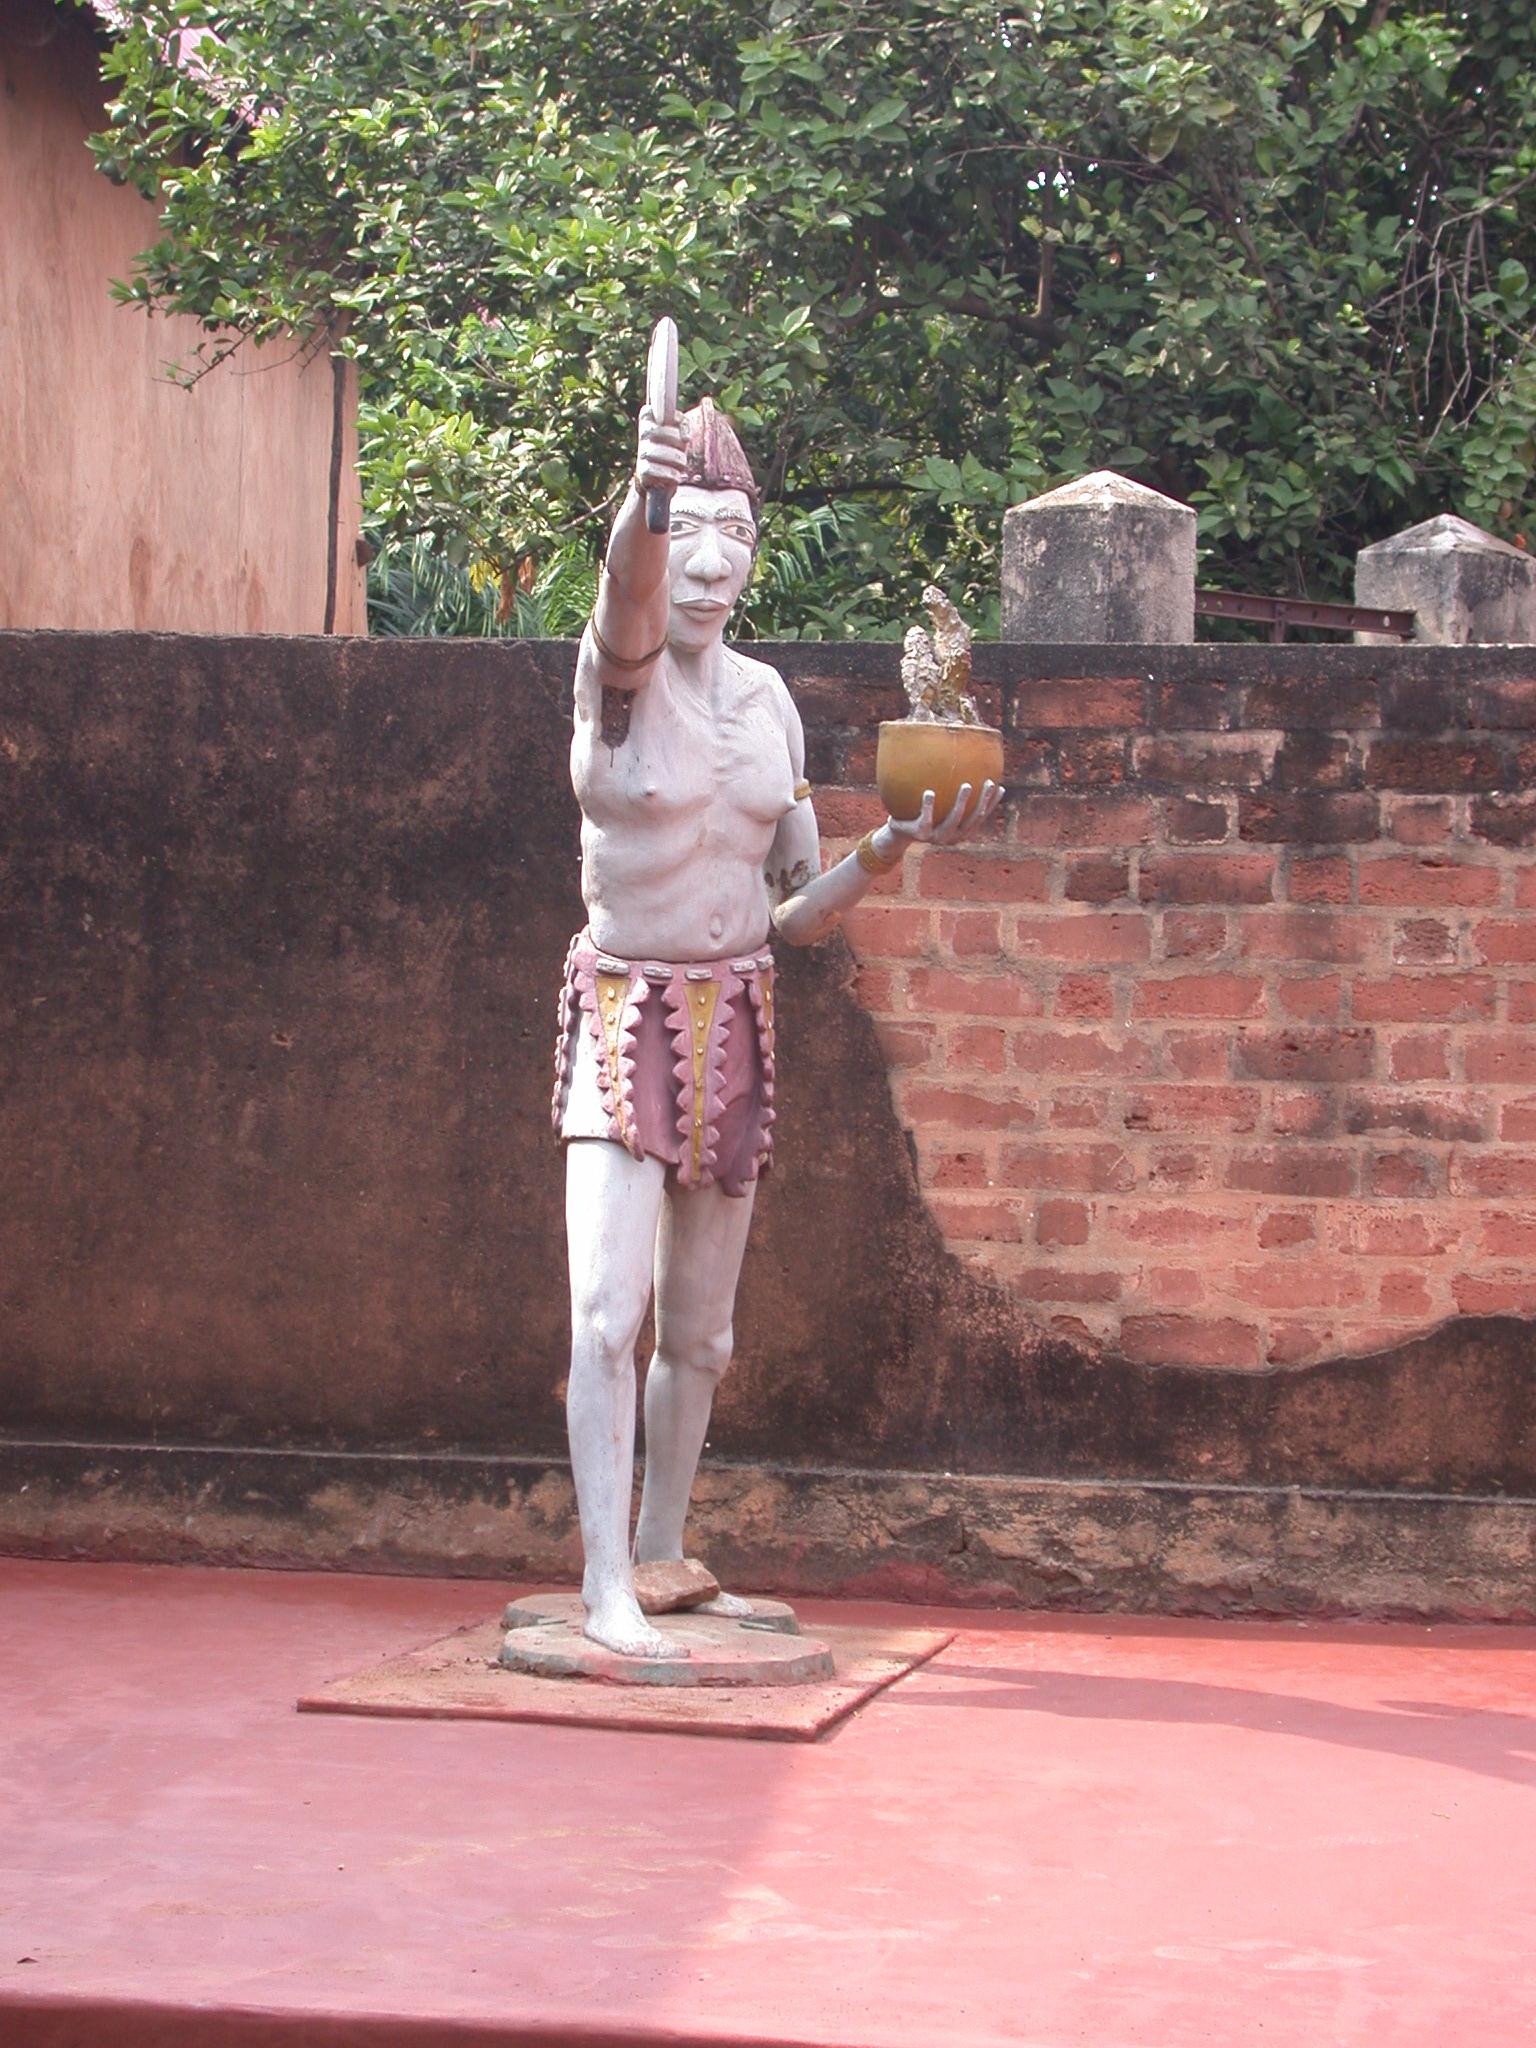 Statue at Musée Honmé, Porto Novo, Benin